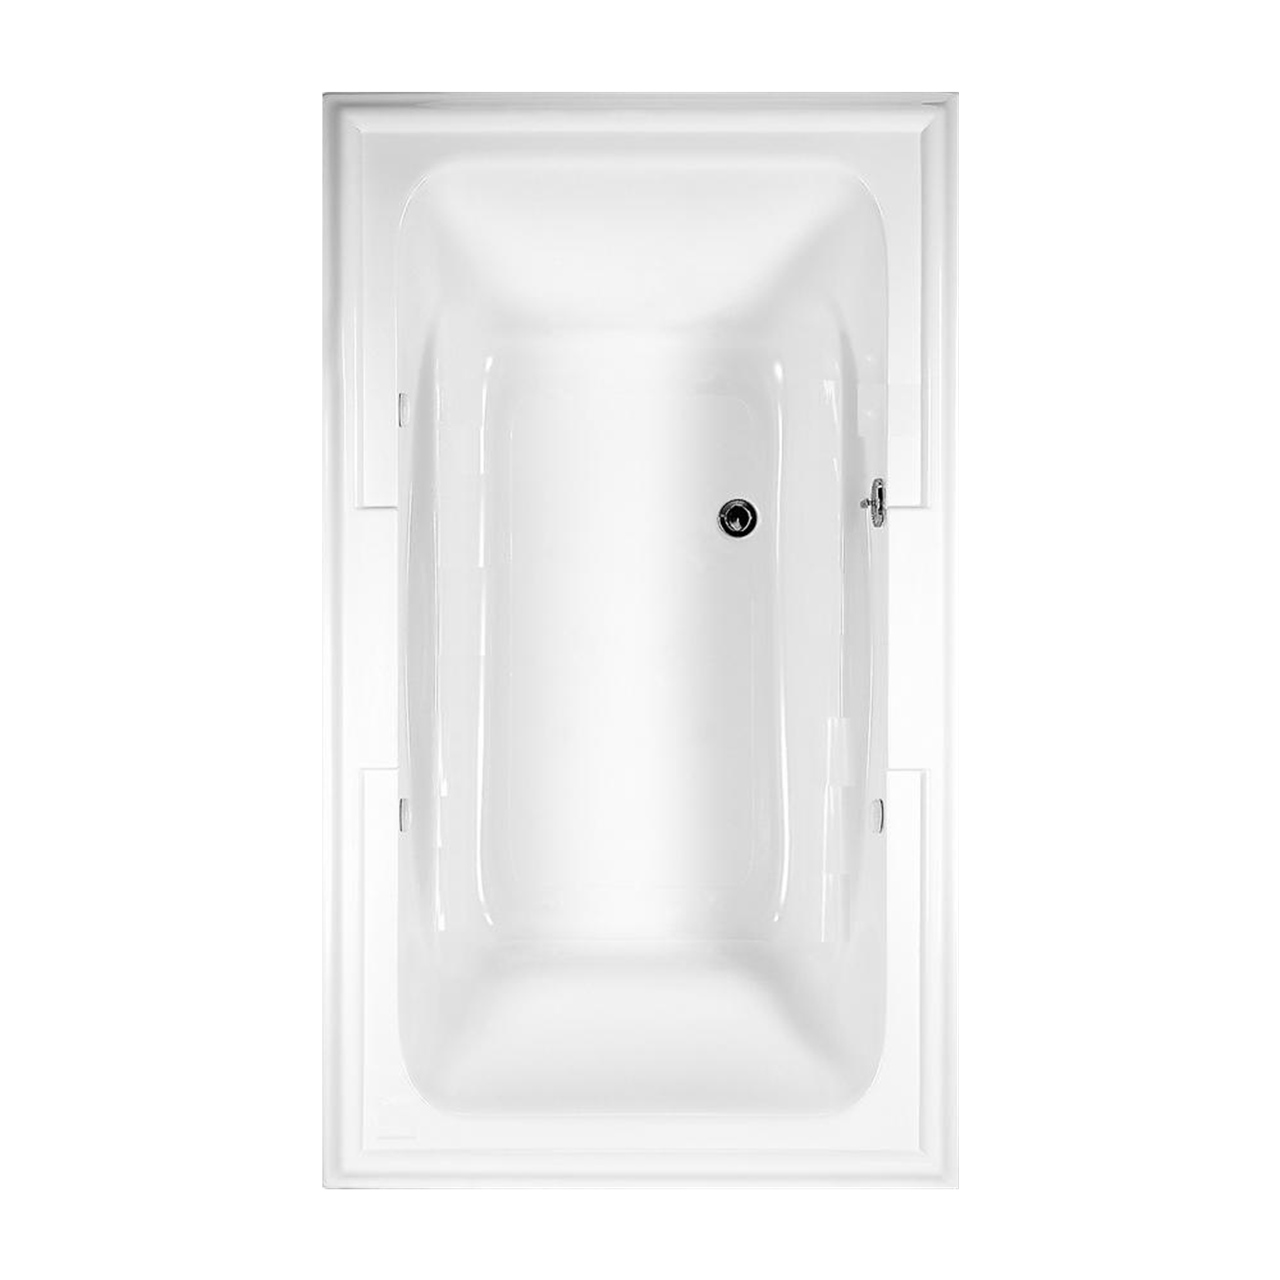 Town Square 72x42 inch Bathtub | American Standard | Island ideas ...